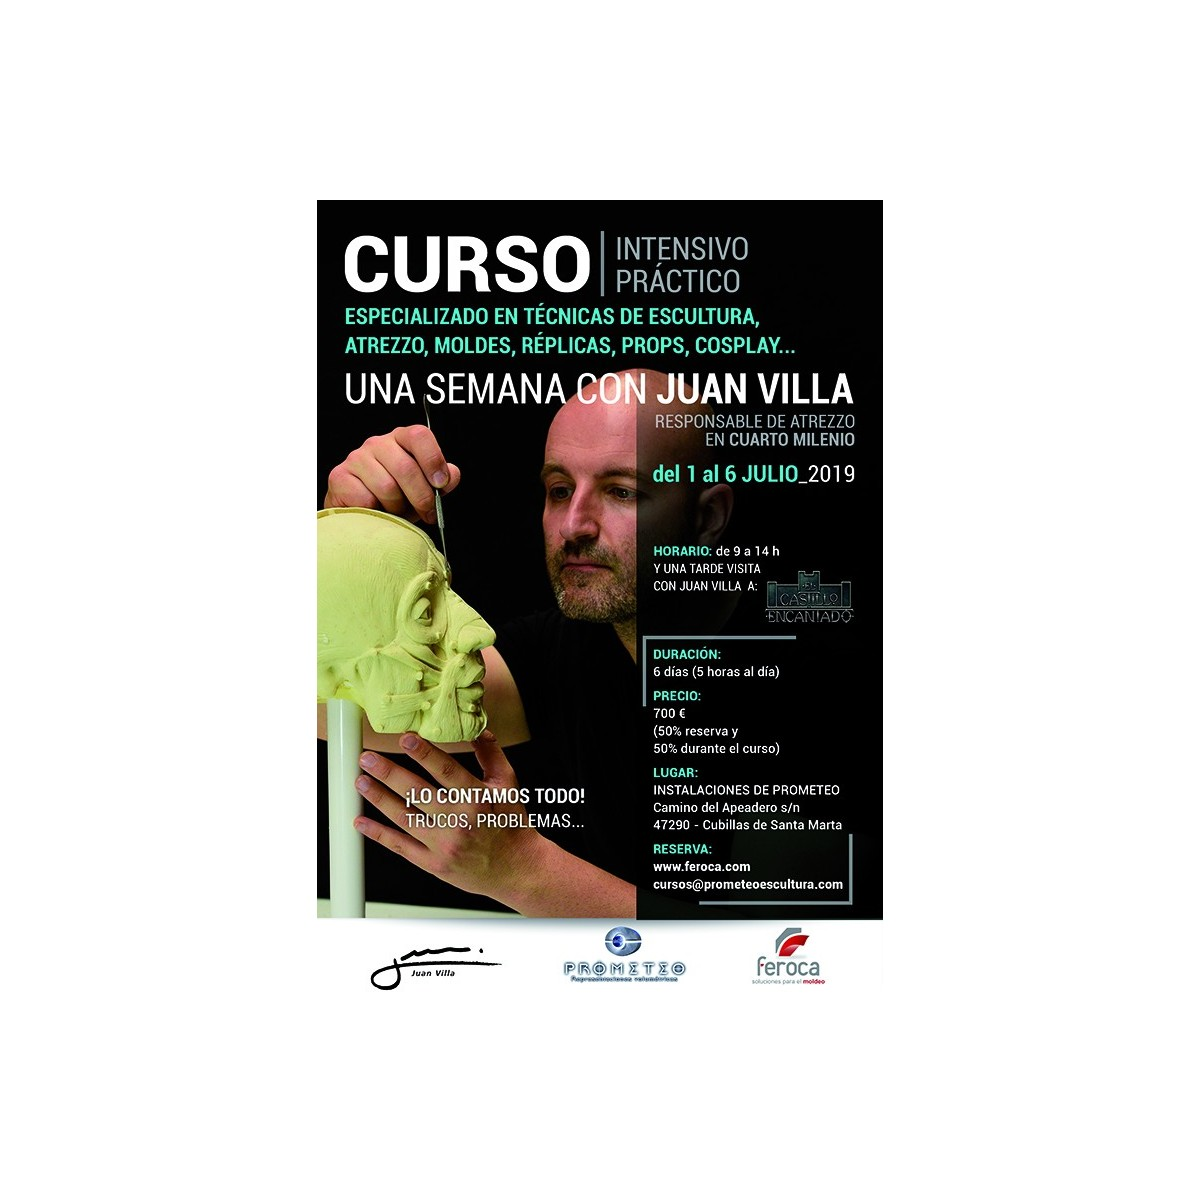 Curso Intensivo 1 semana con Juan Villa (1 al 6-07-2019) - Feroca, S.A.